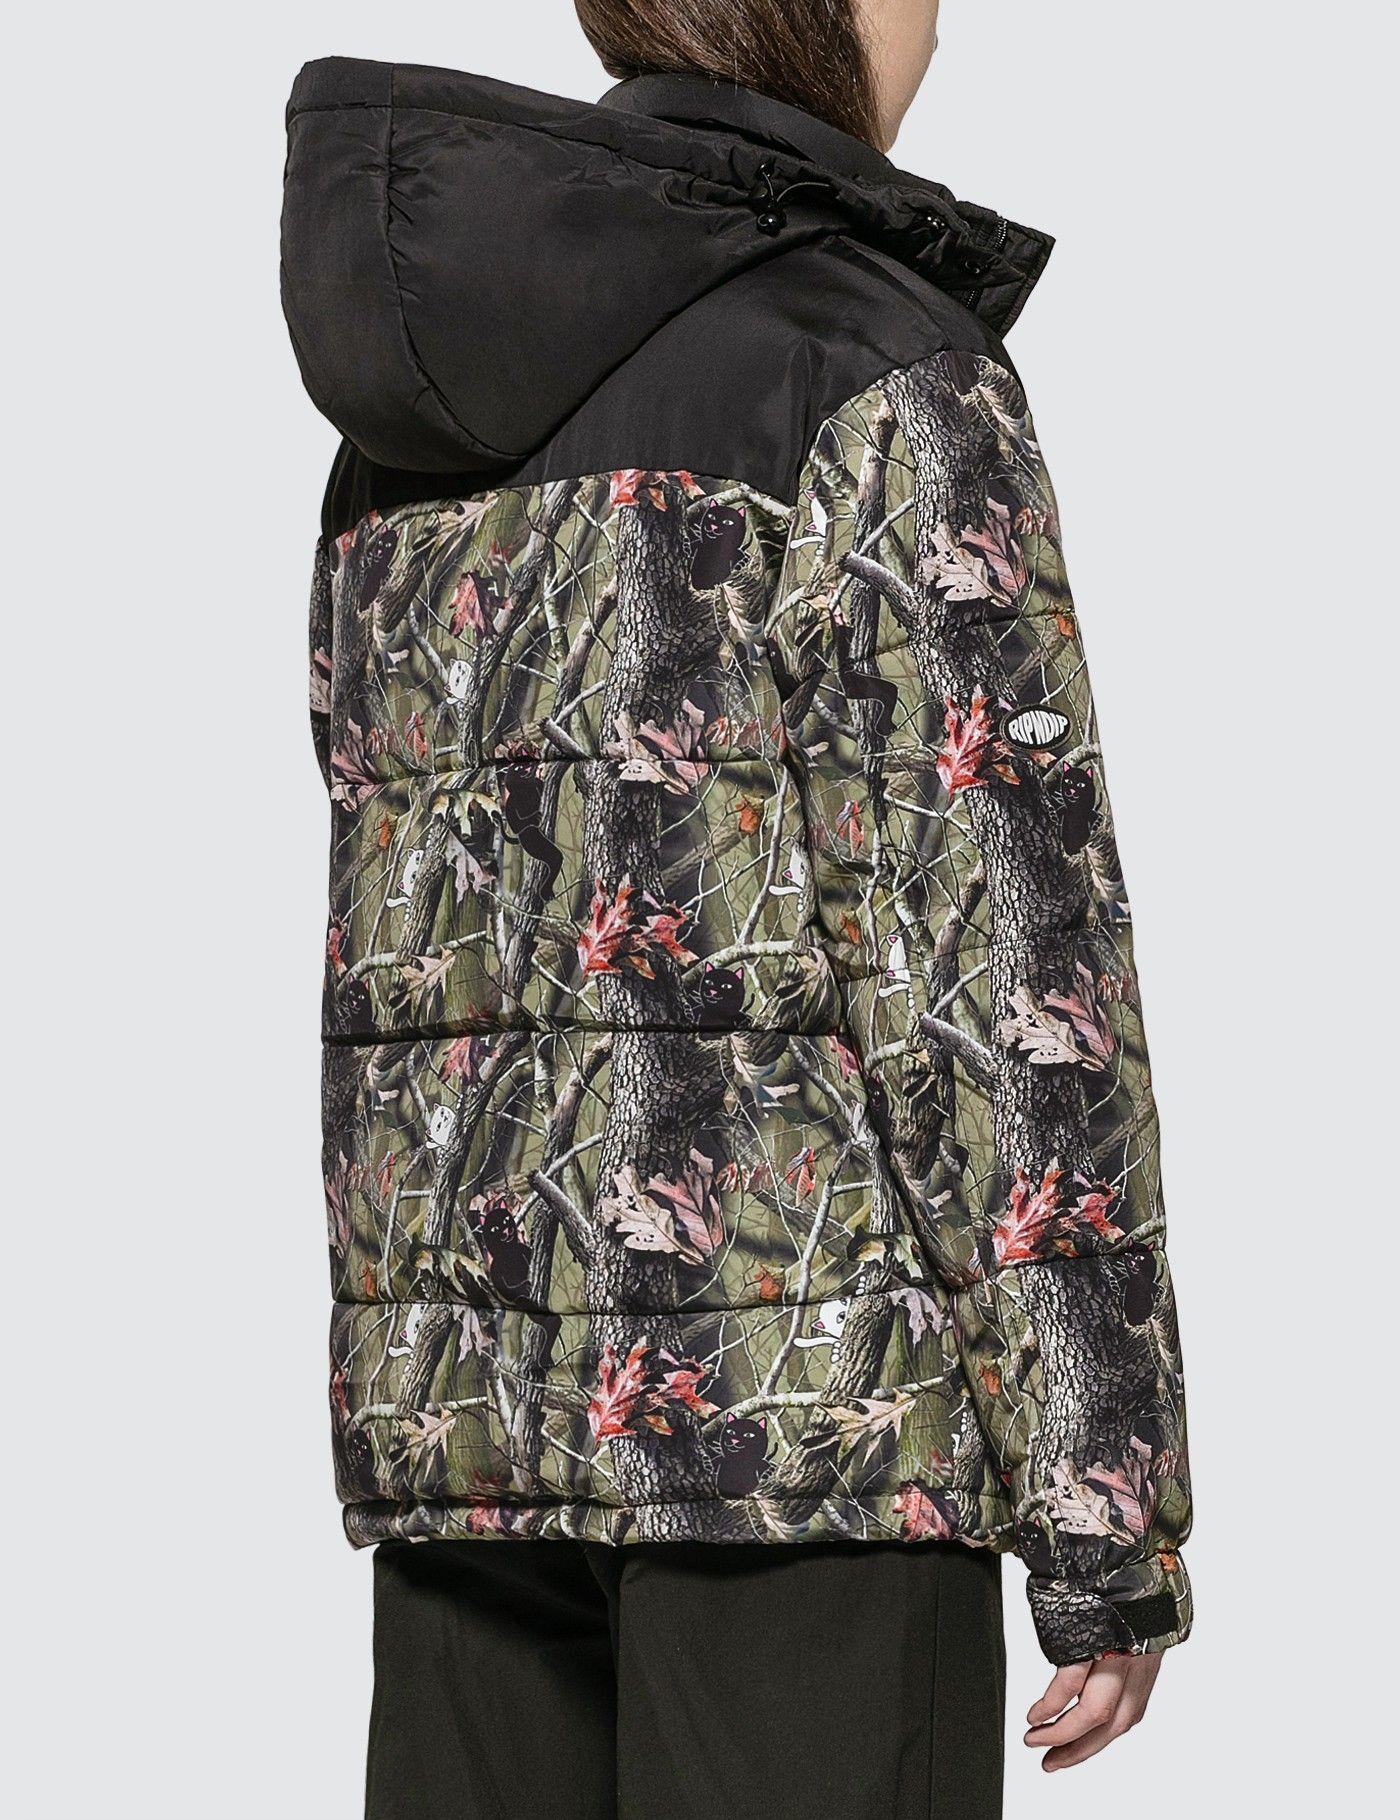 Ripndip Nerm Jerm Tree Camo Puffer Jacket Hbx Camo Puffer Jacket Puffer Jackets Shopping Outfit [ 1820 x 1400 Pixel ]